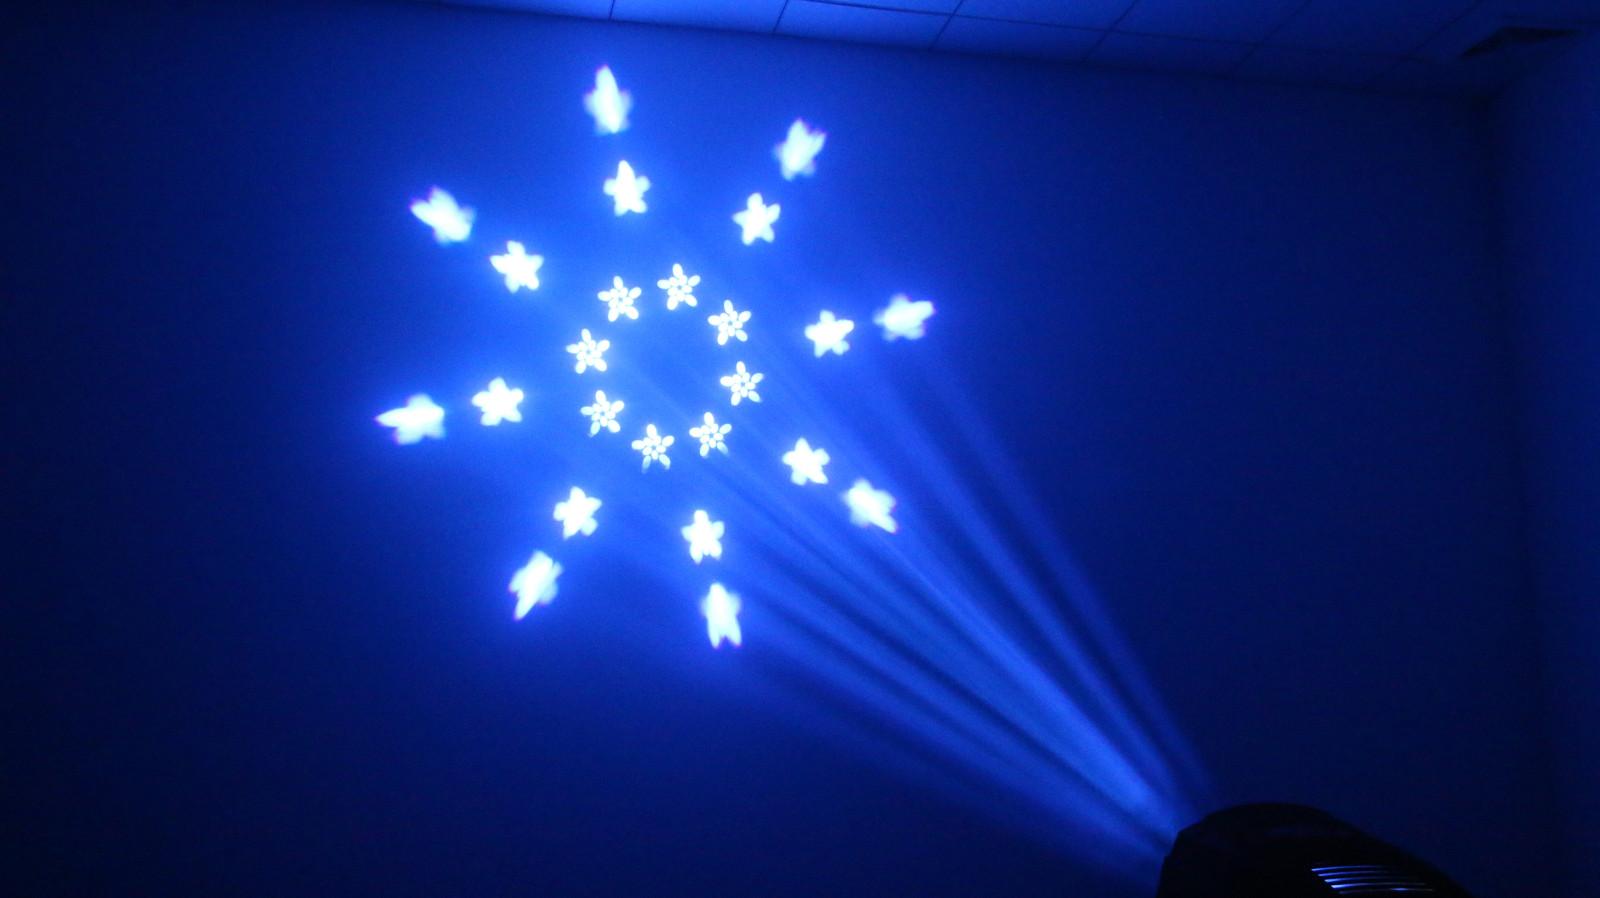 spot beam light to decorative for band Marslite-4